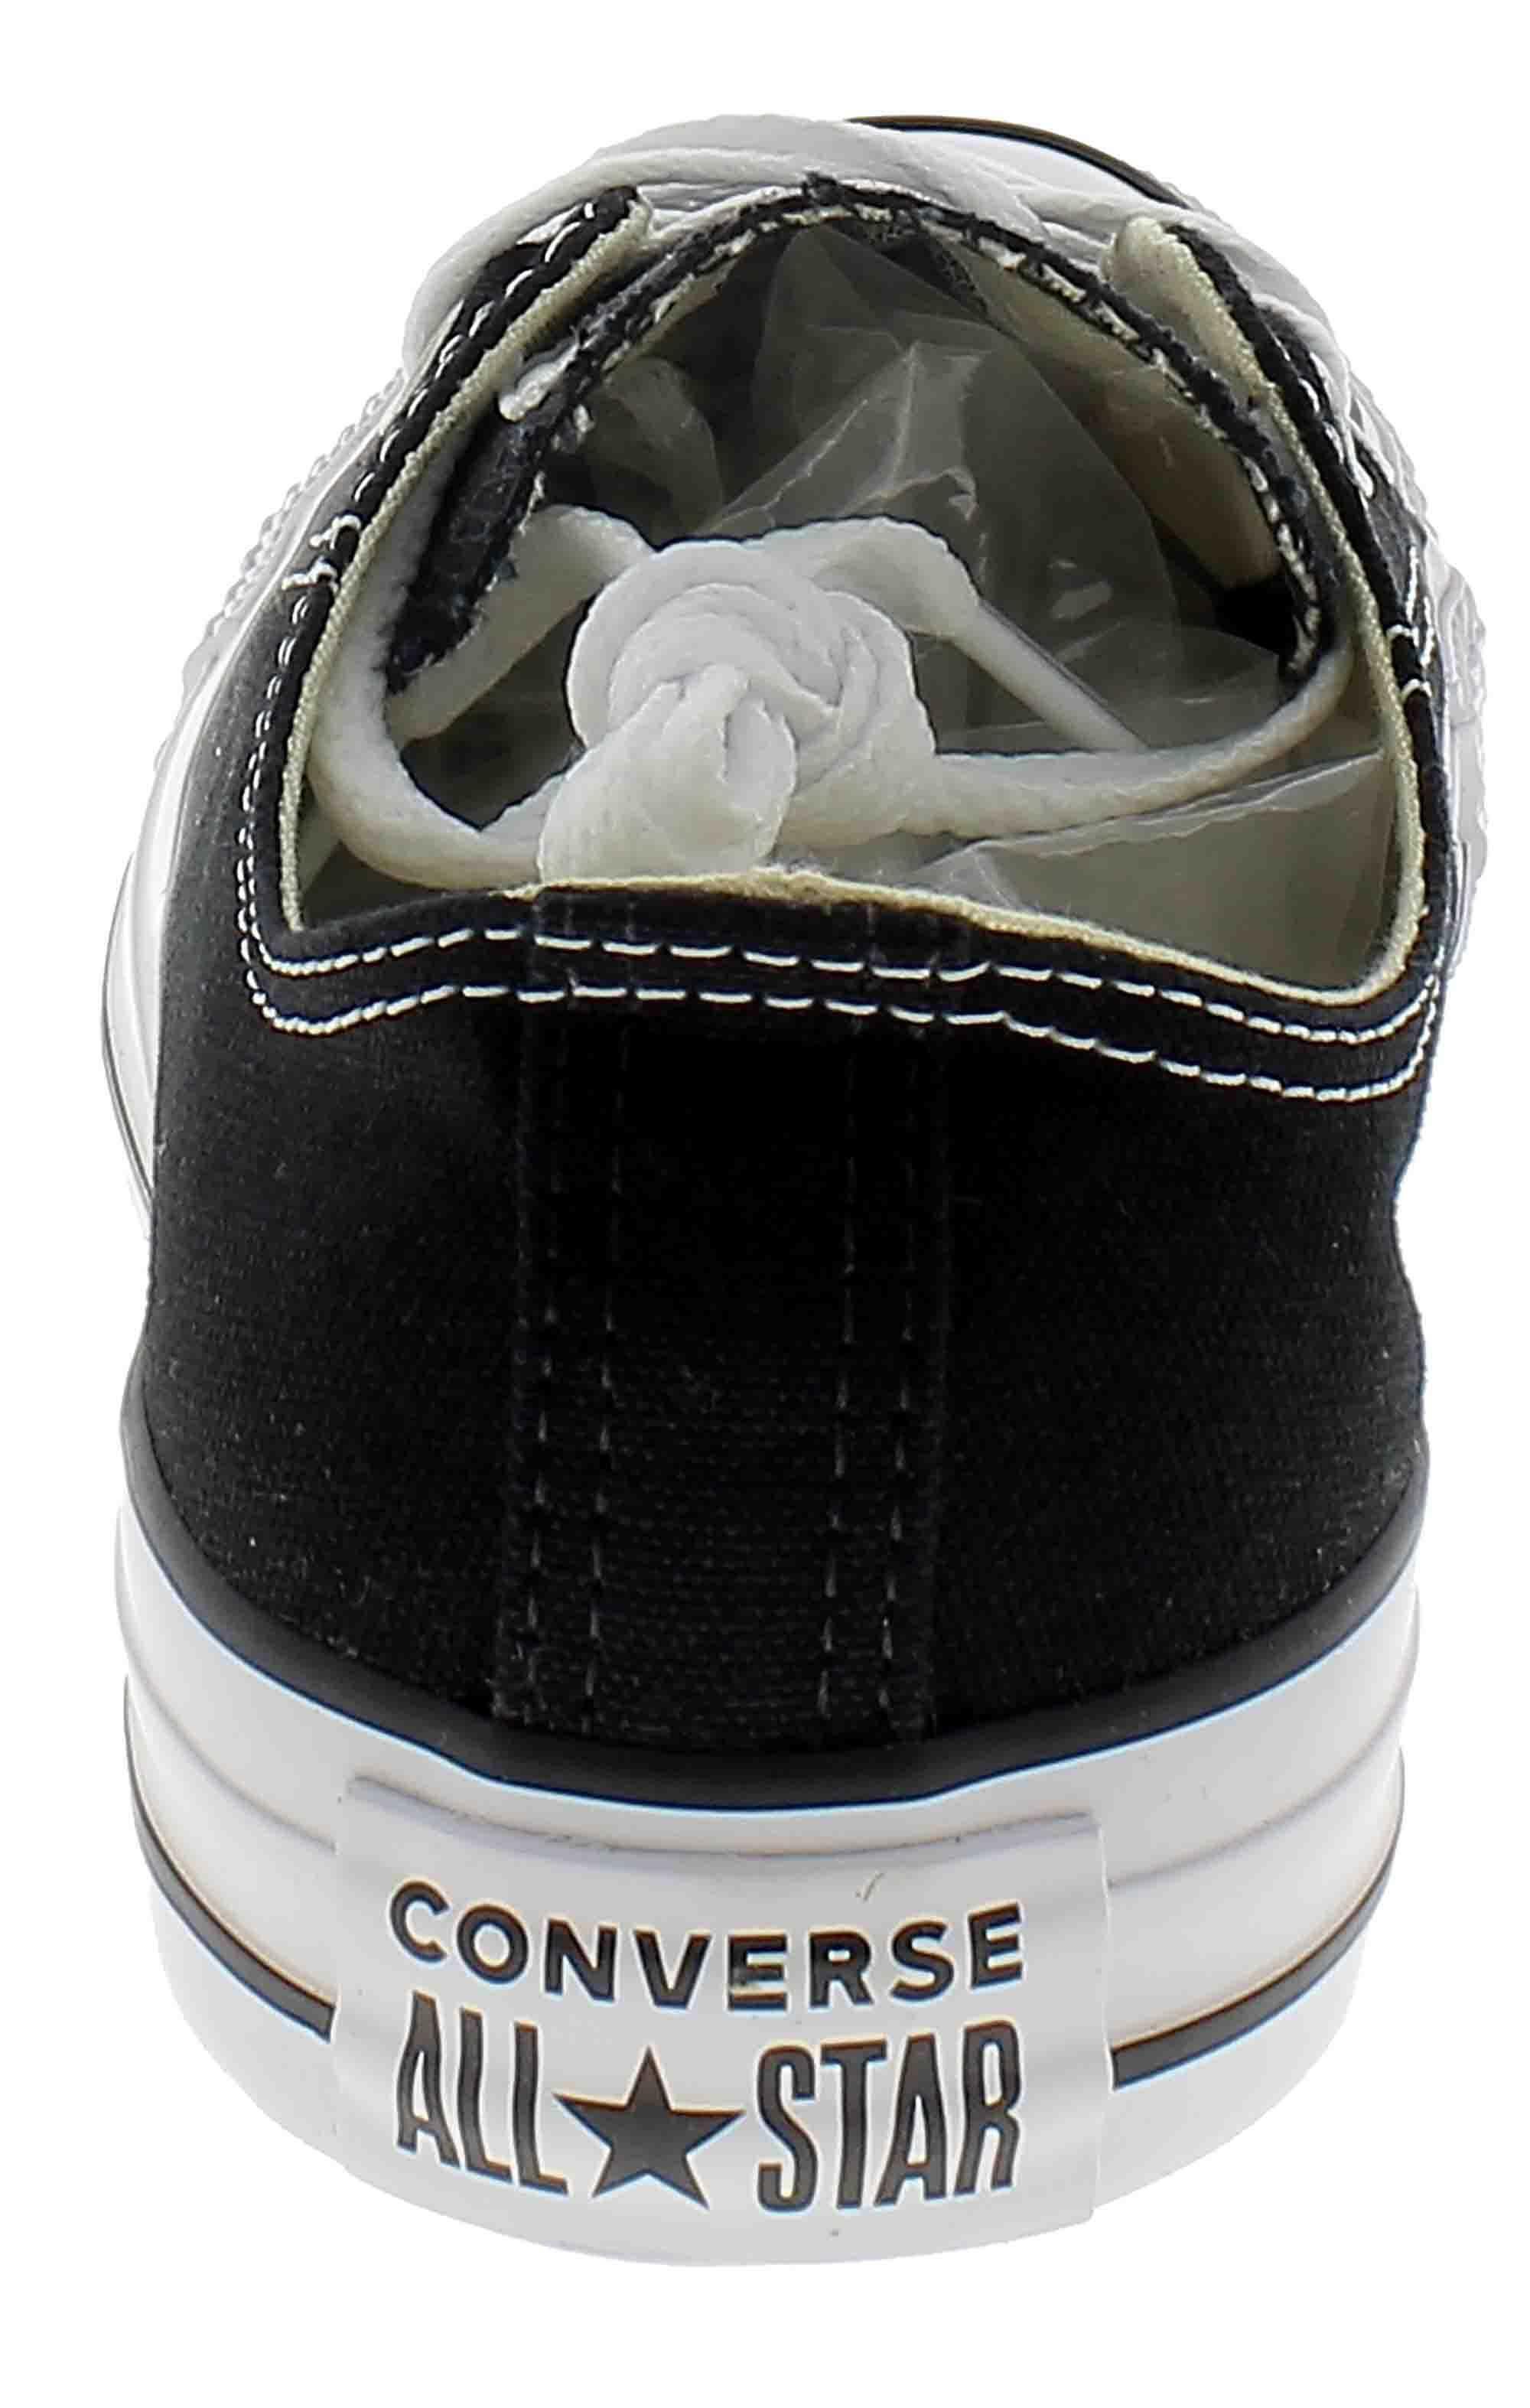 Zapatillassneakersunisex Converse All Star Ox Black M9166c 41 EU